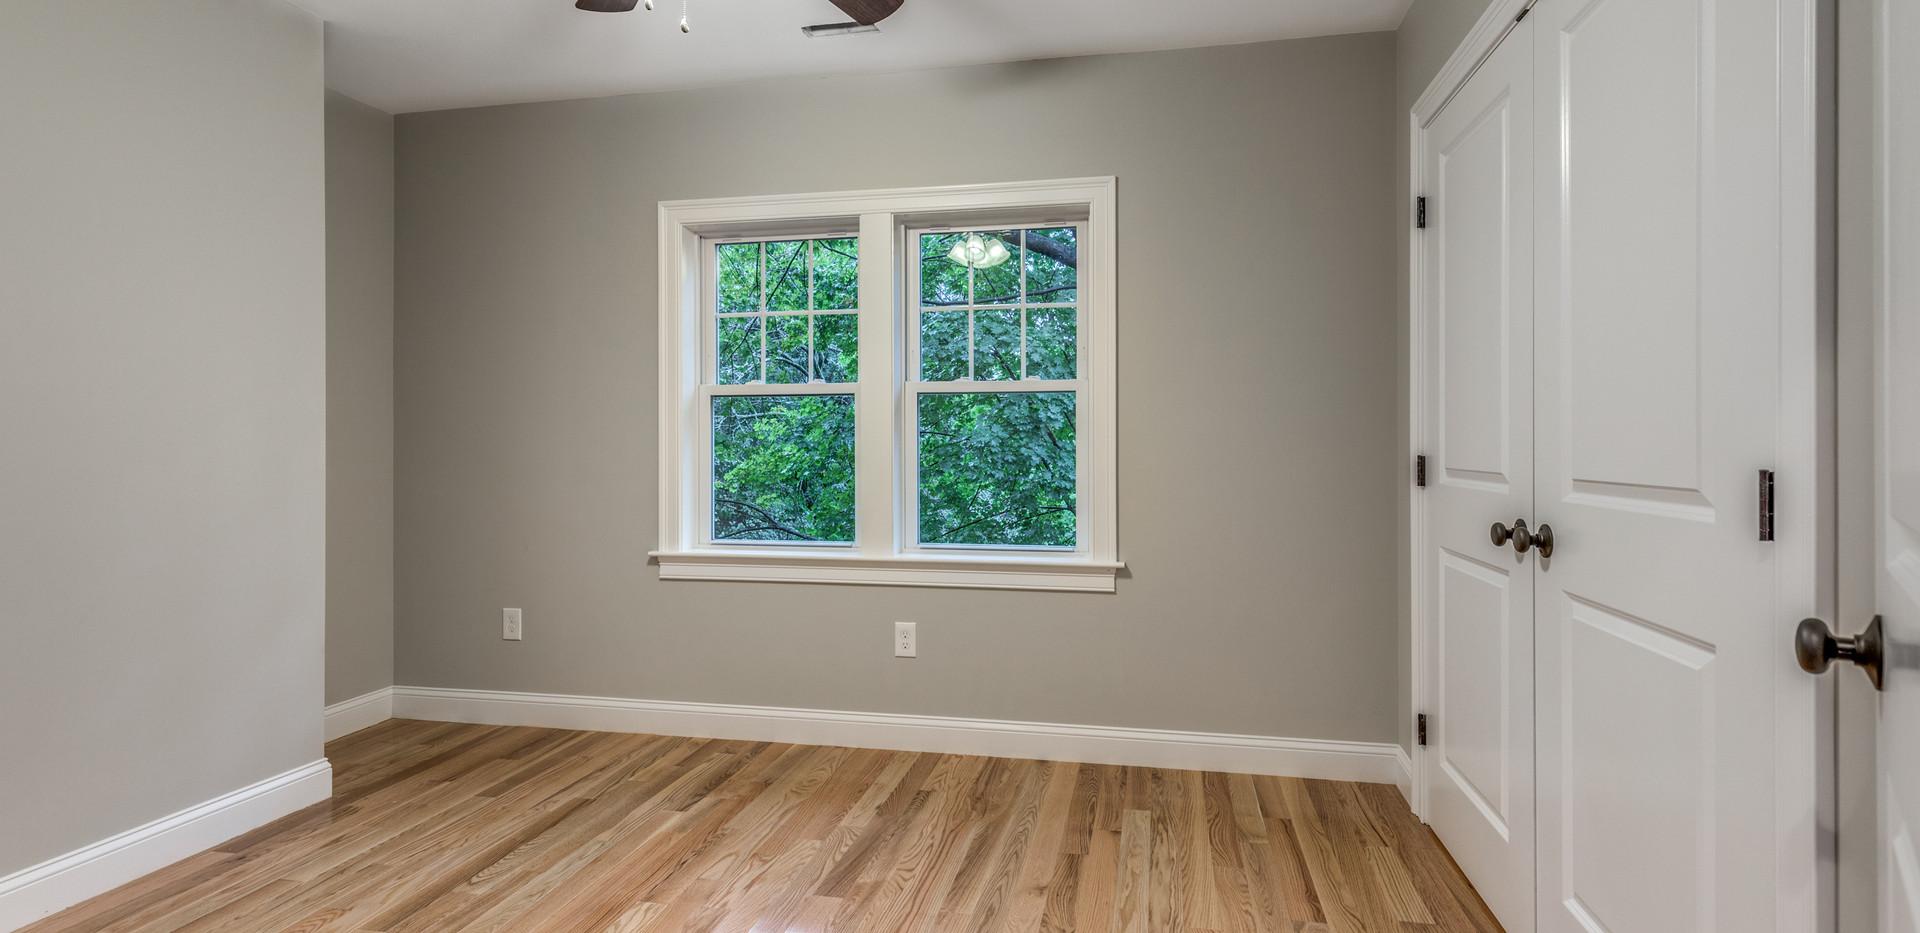 24_Bedroom-6.jpg